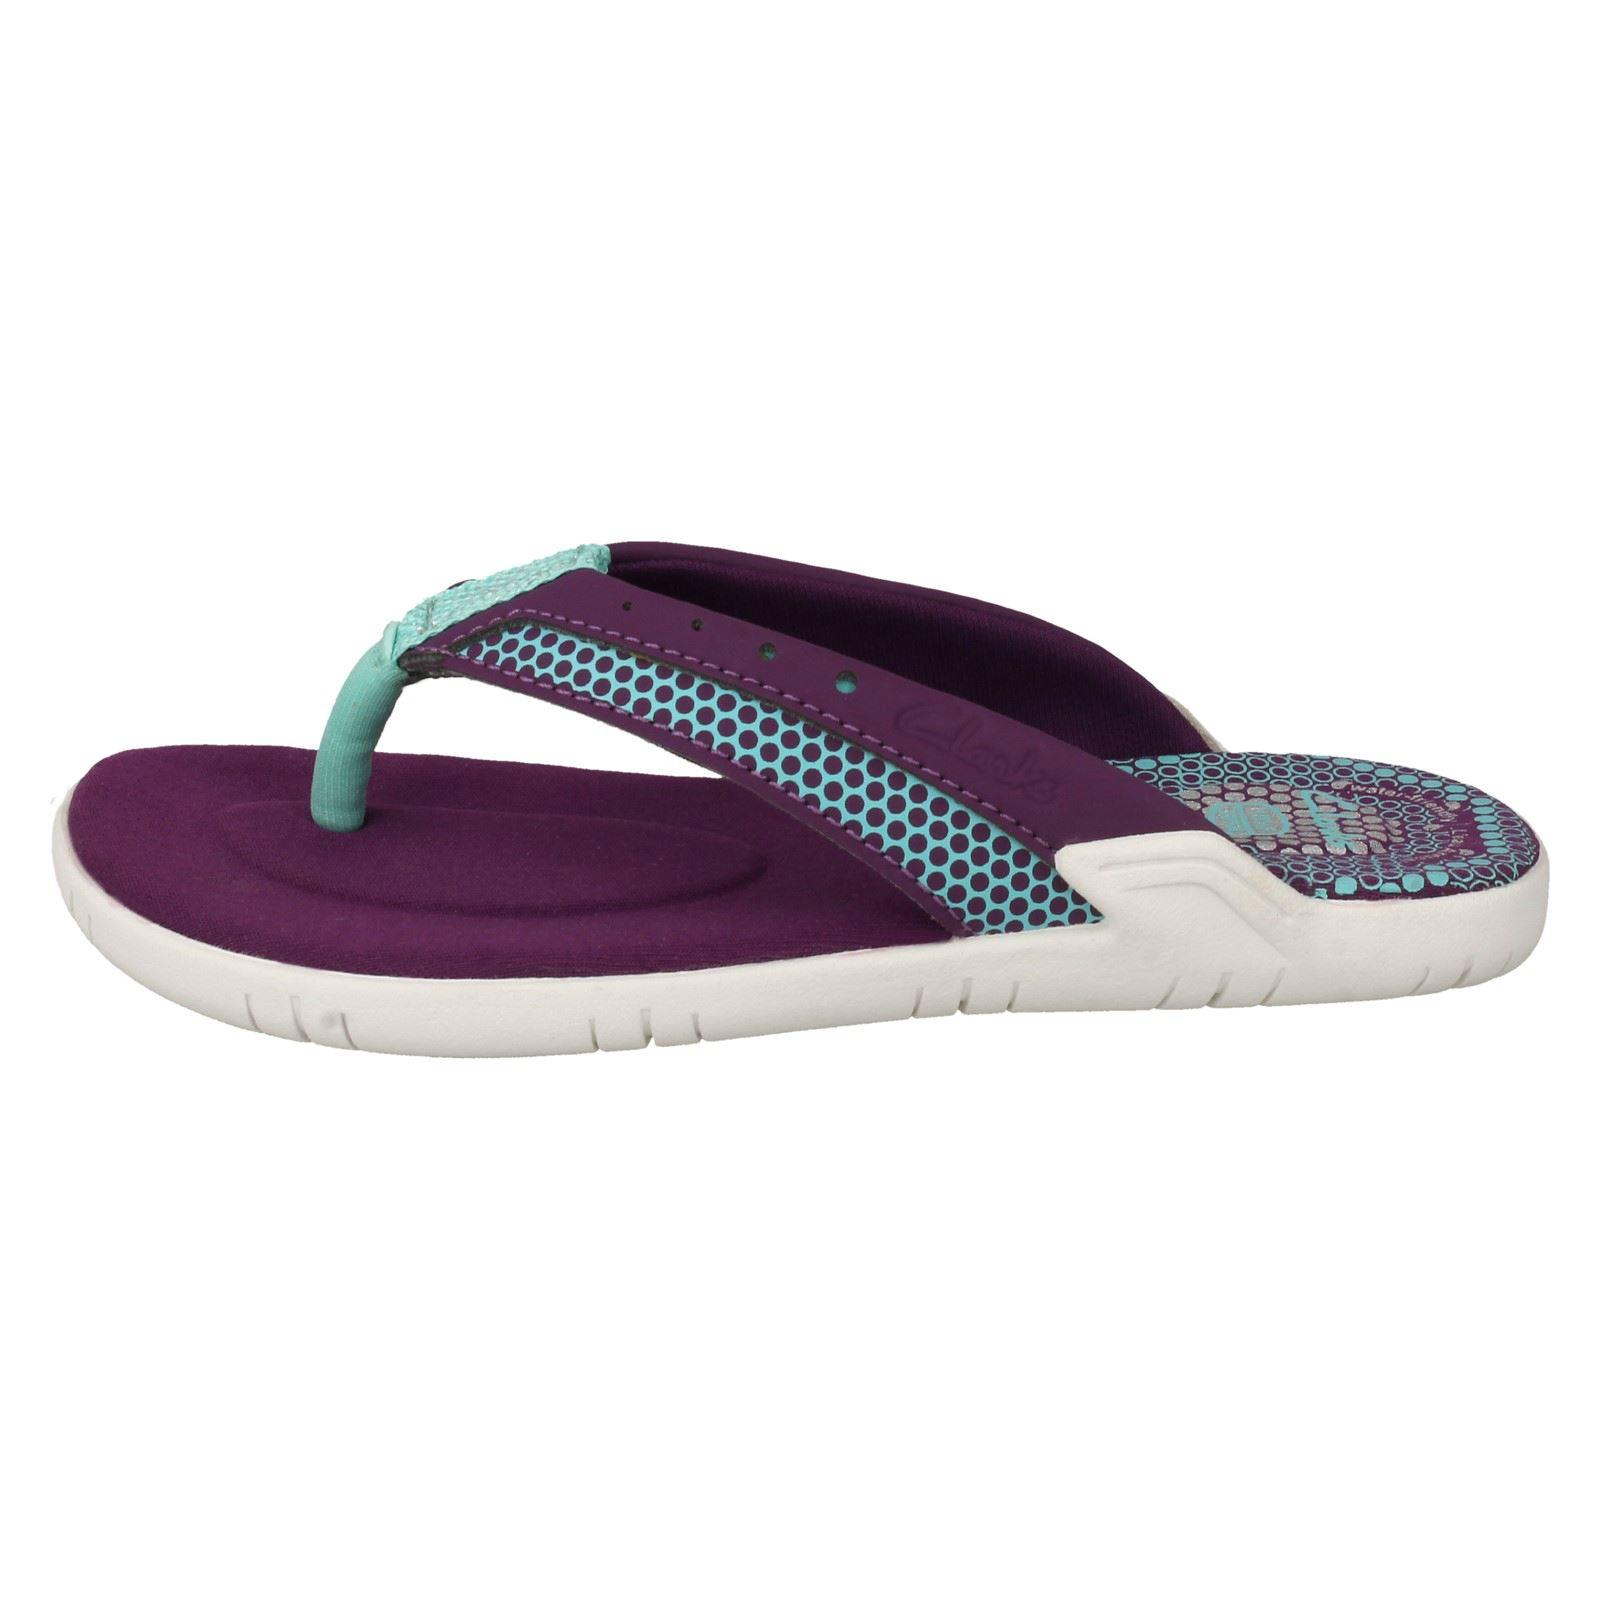 Girls-Clarks-Sandals-039-Bonza-Lass-039